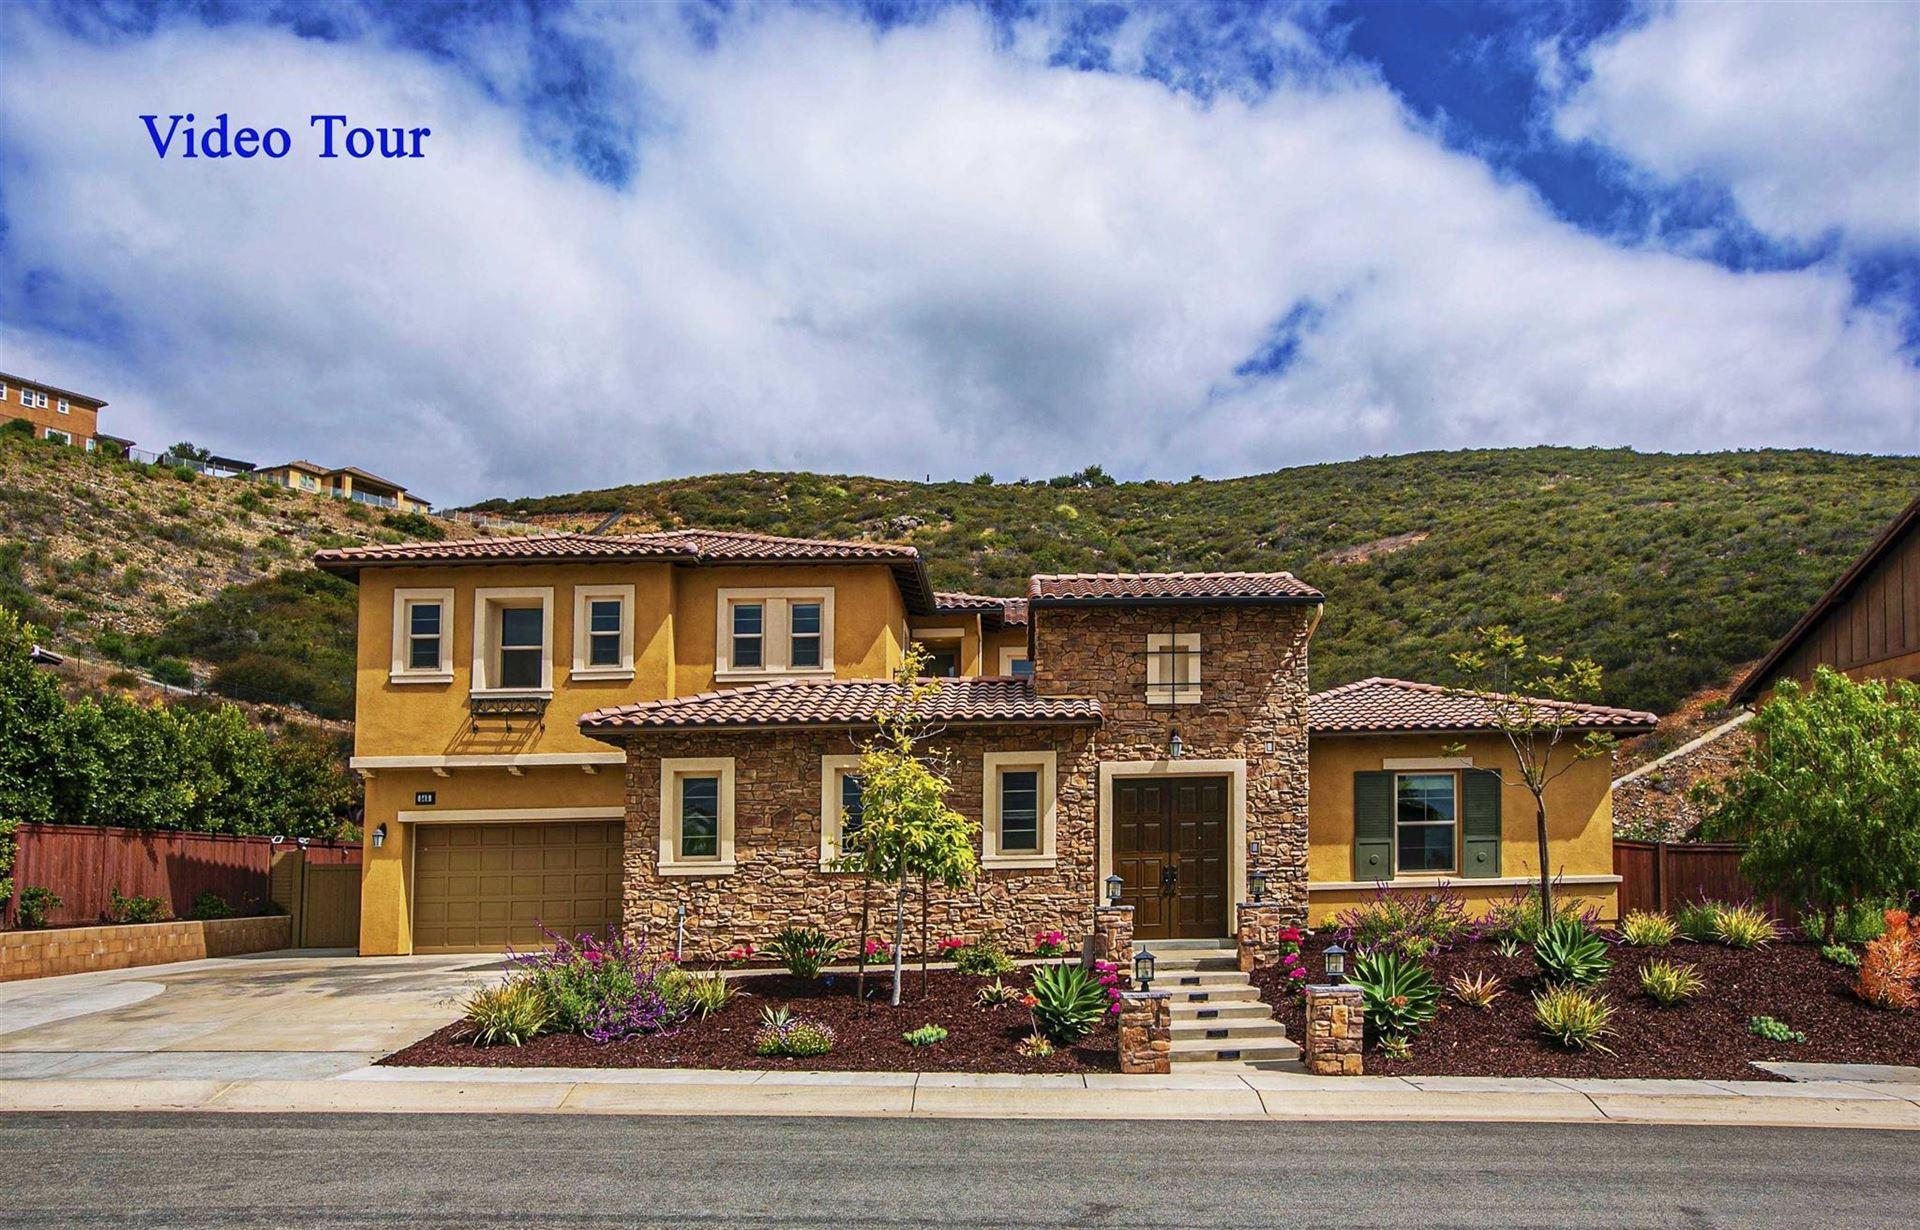 Photo of 545 Ledge St, San Marcos, CA 92078 (MLS # 210015498)